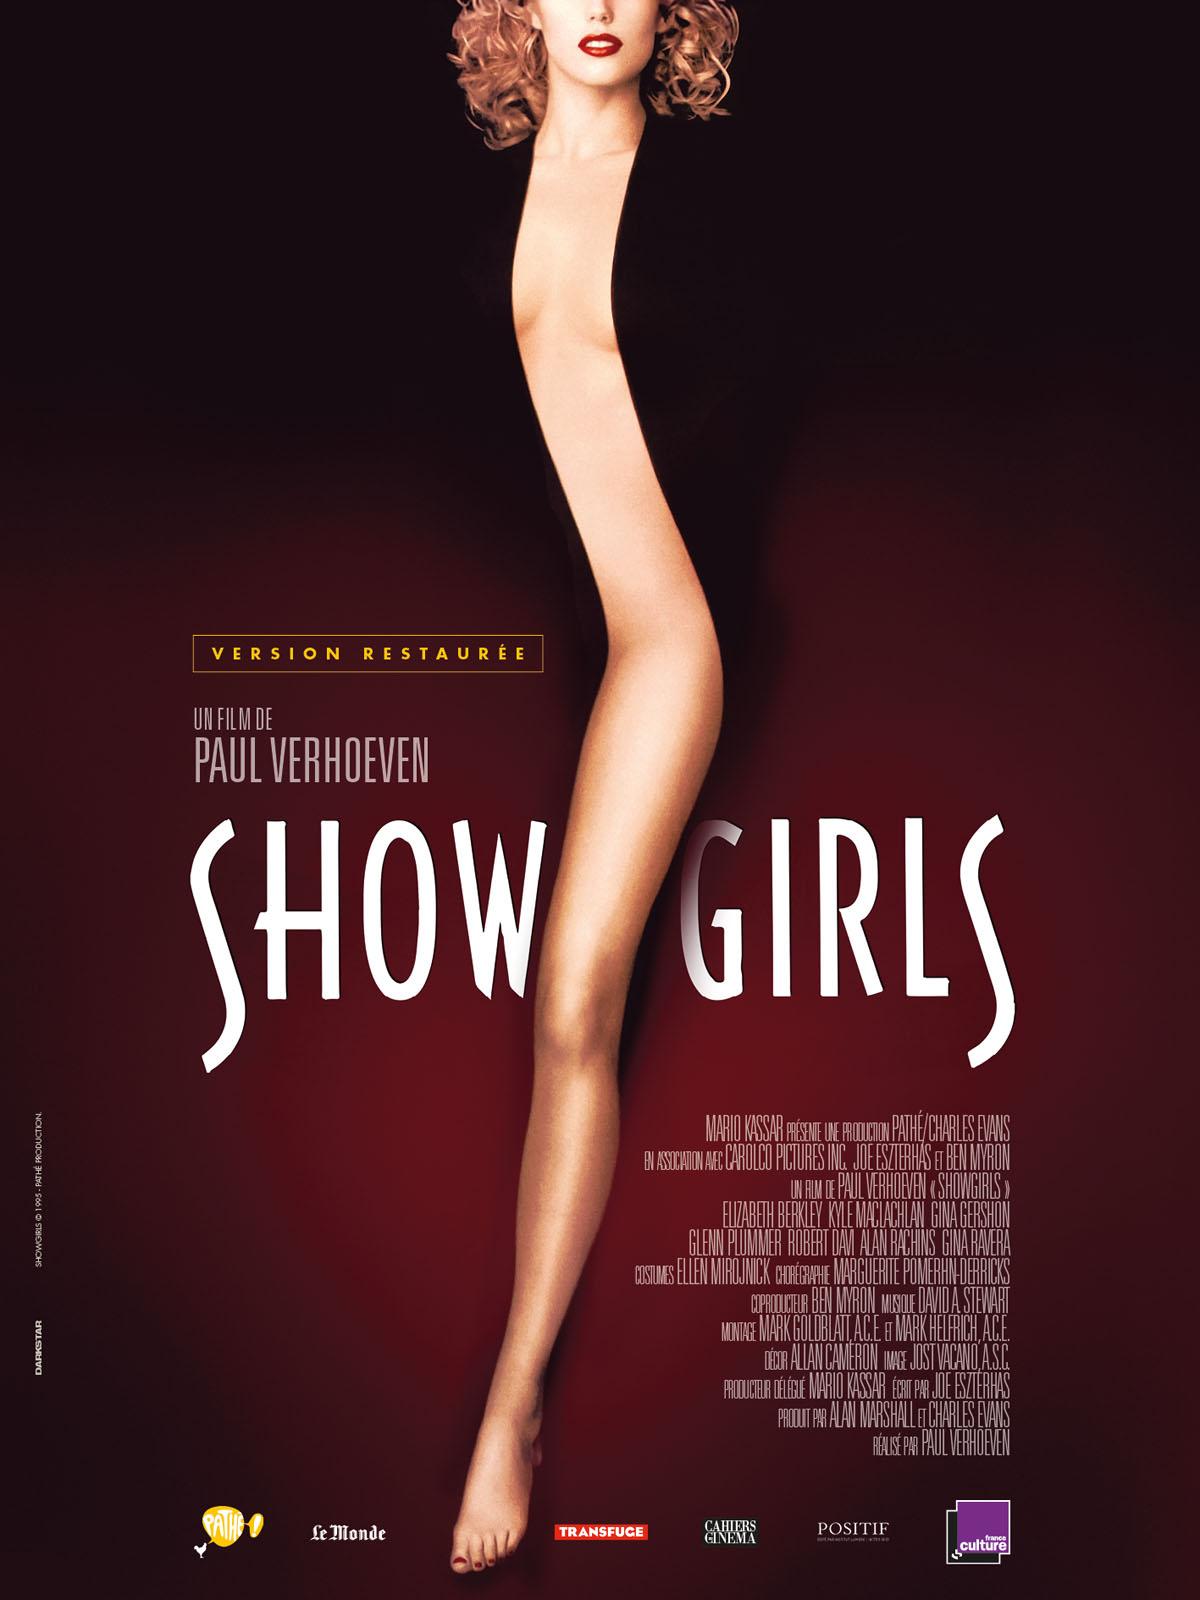 Télécharger Showgirls DVDRIP TUREFRENCH